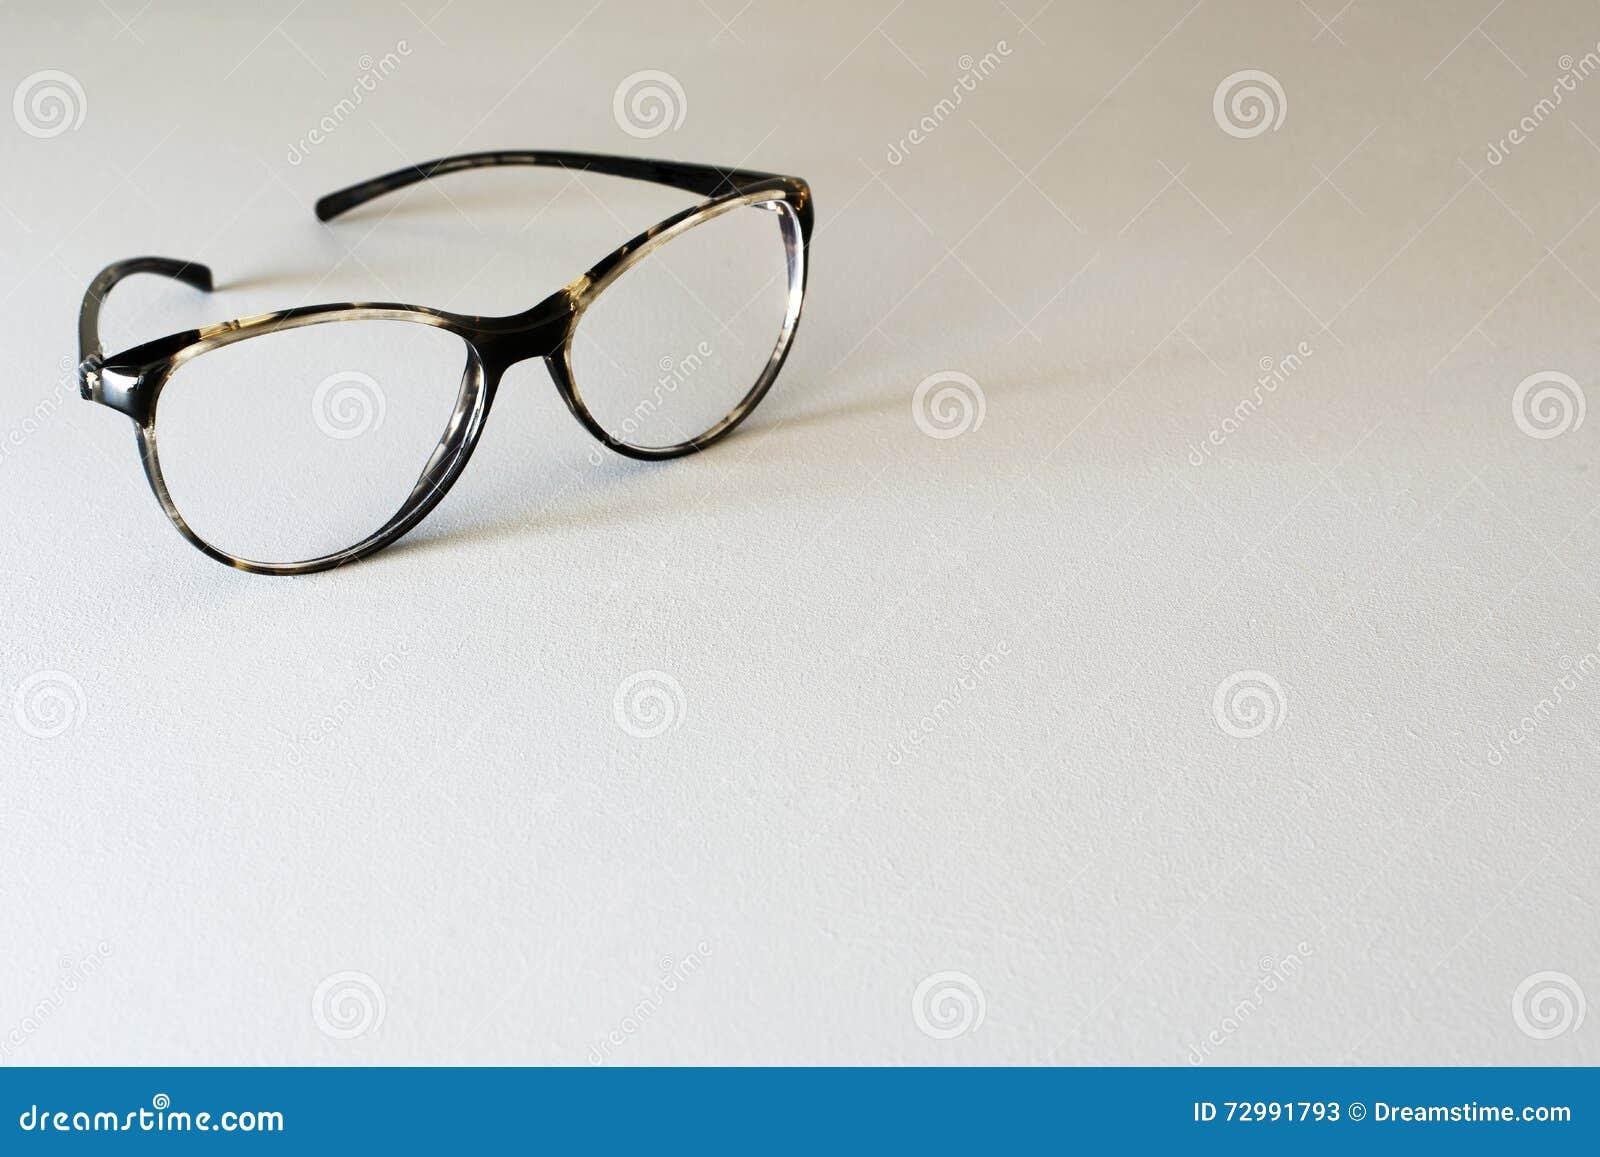 Ladies reading glasses